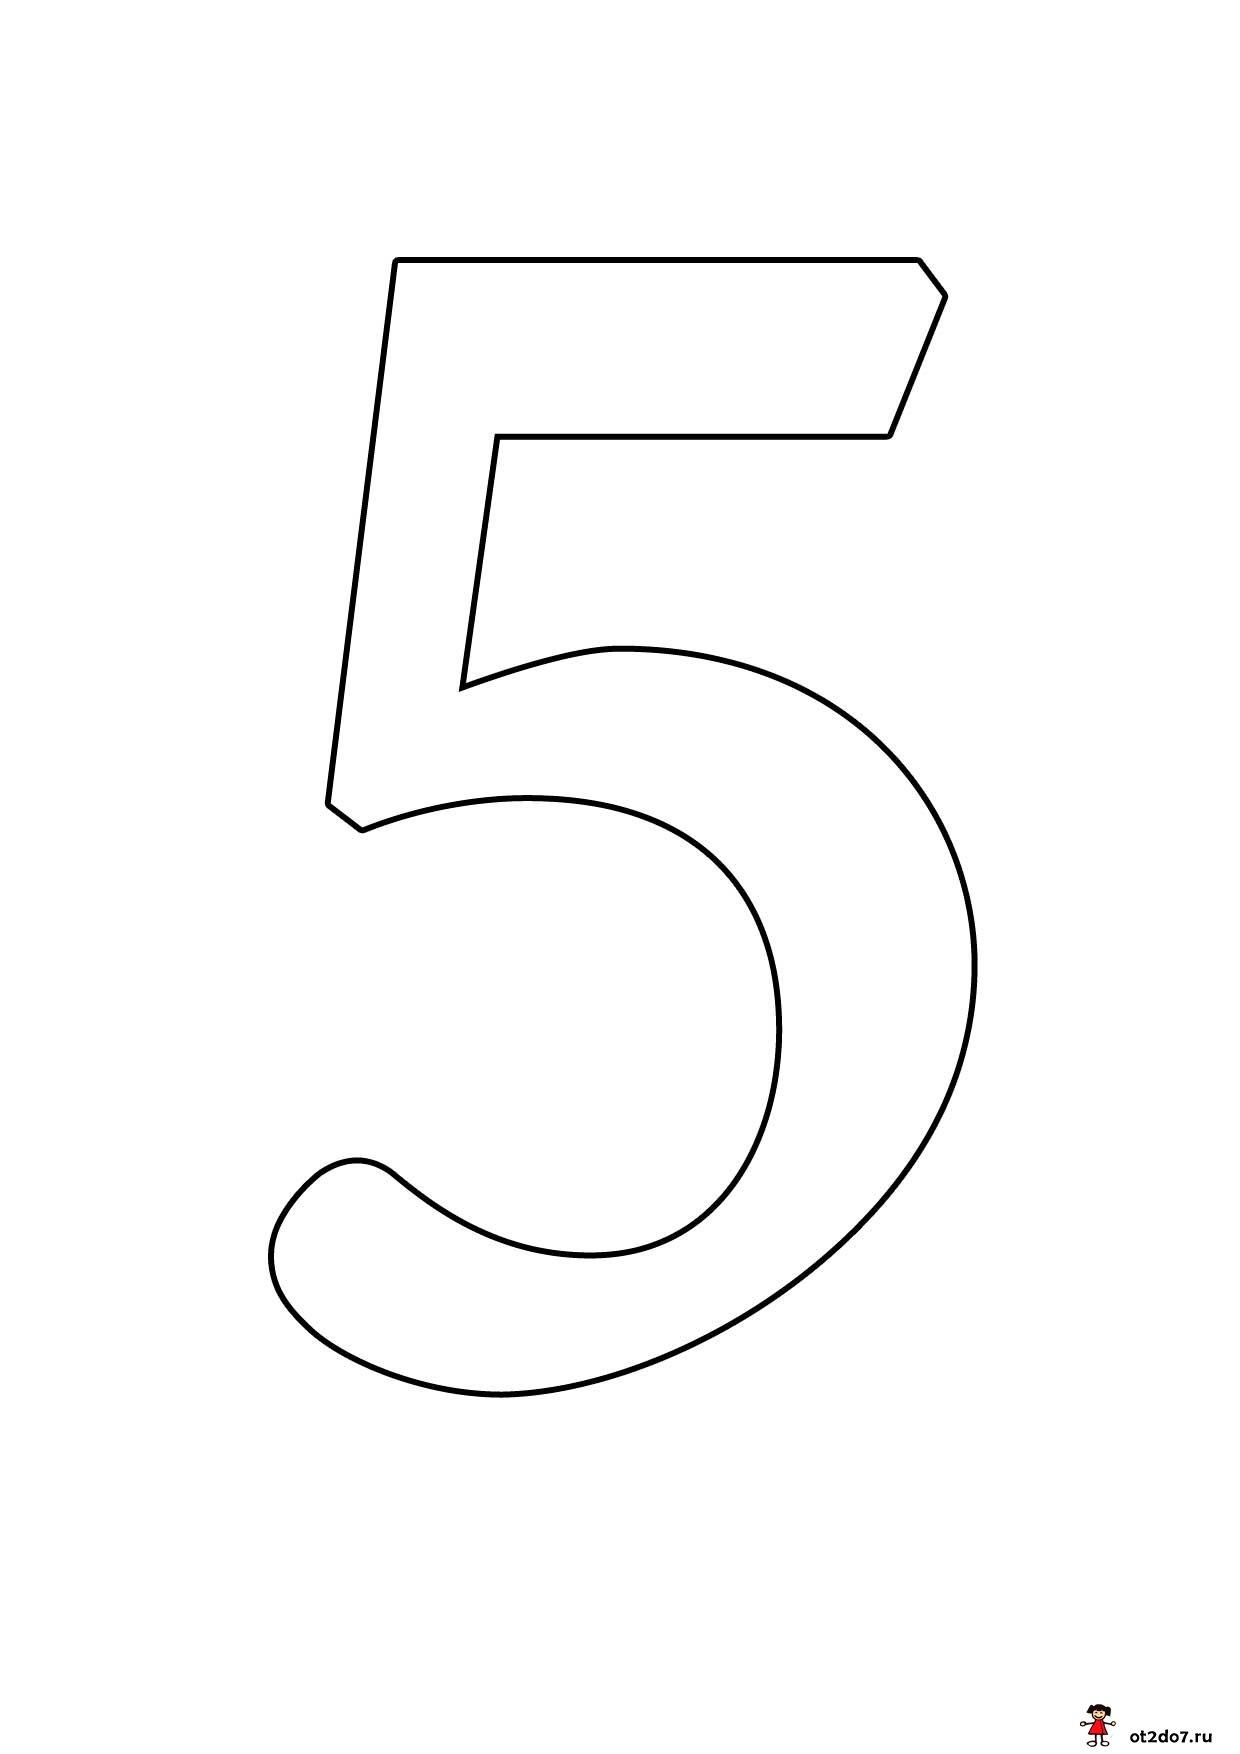 Скачать цифру 3 на формат а4